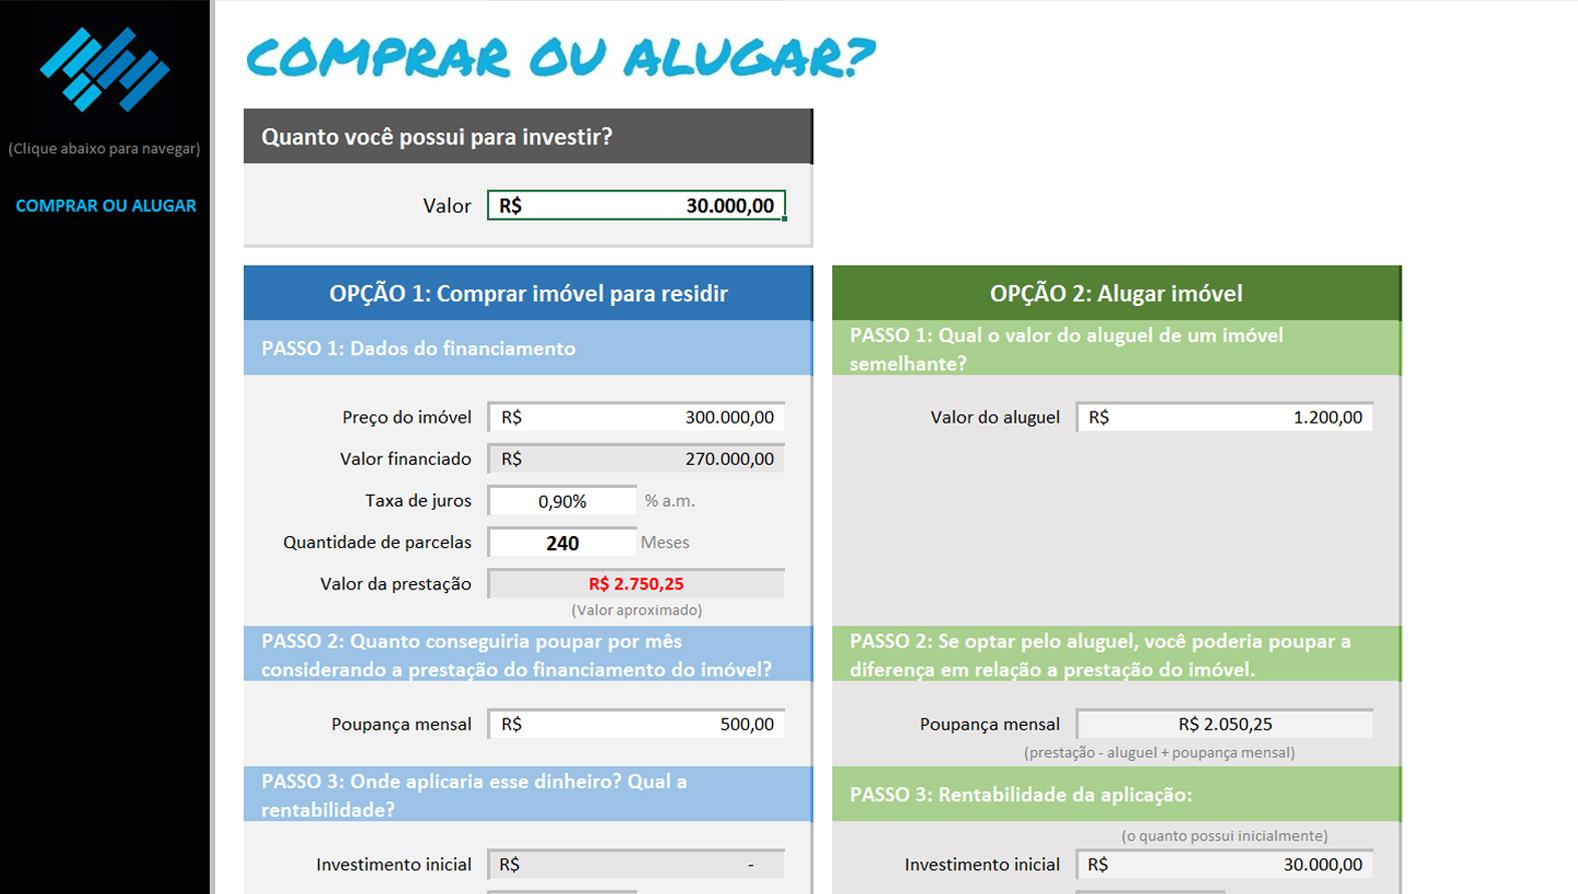 1_Comprar_x_Alugar.jpg